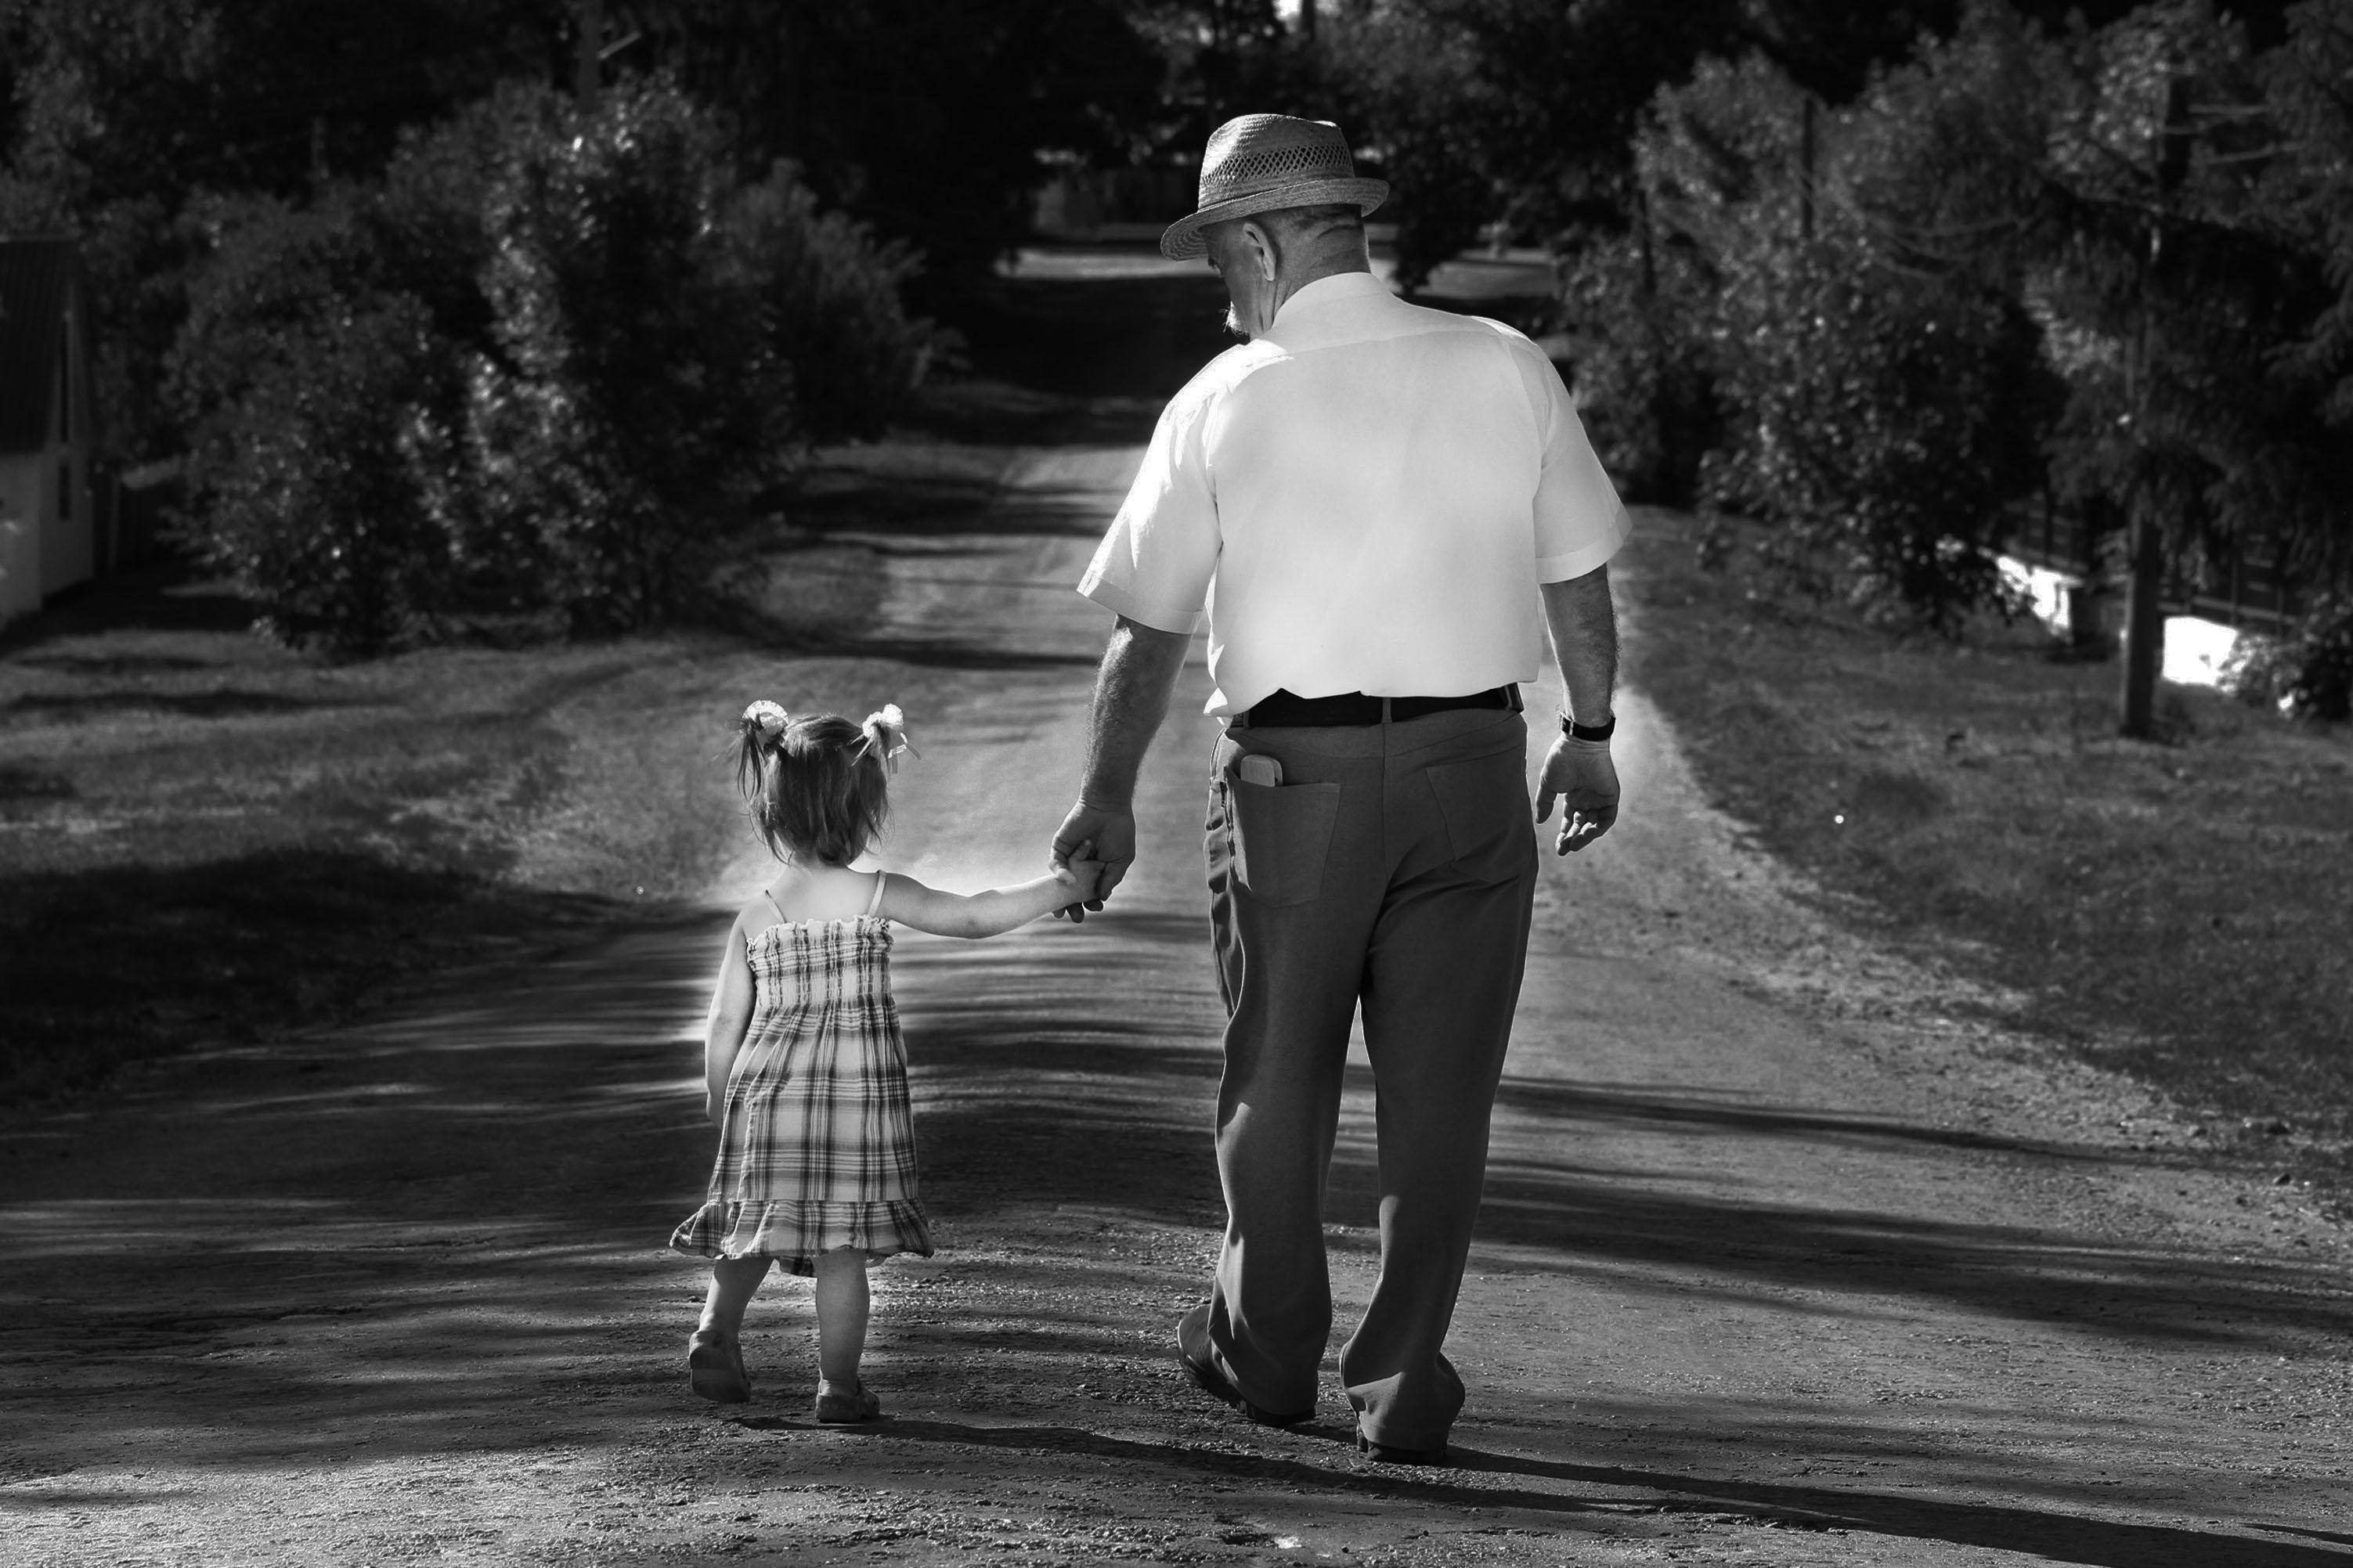 Grandpa and her blonde grand daughter